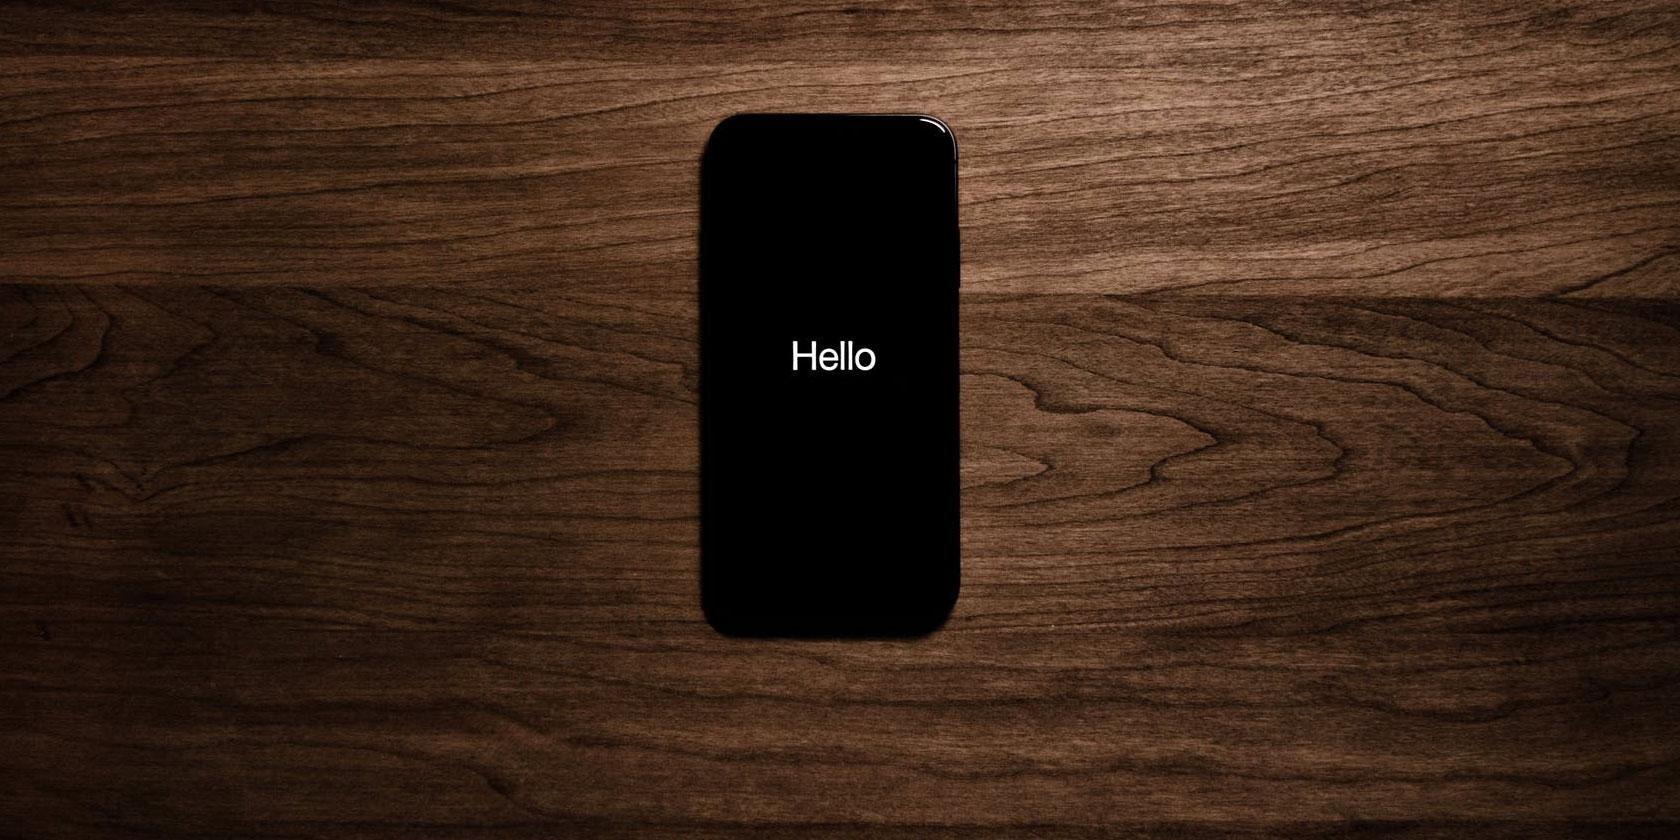 iphone-dark-mode-apps